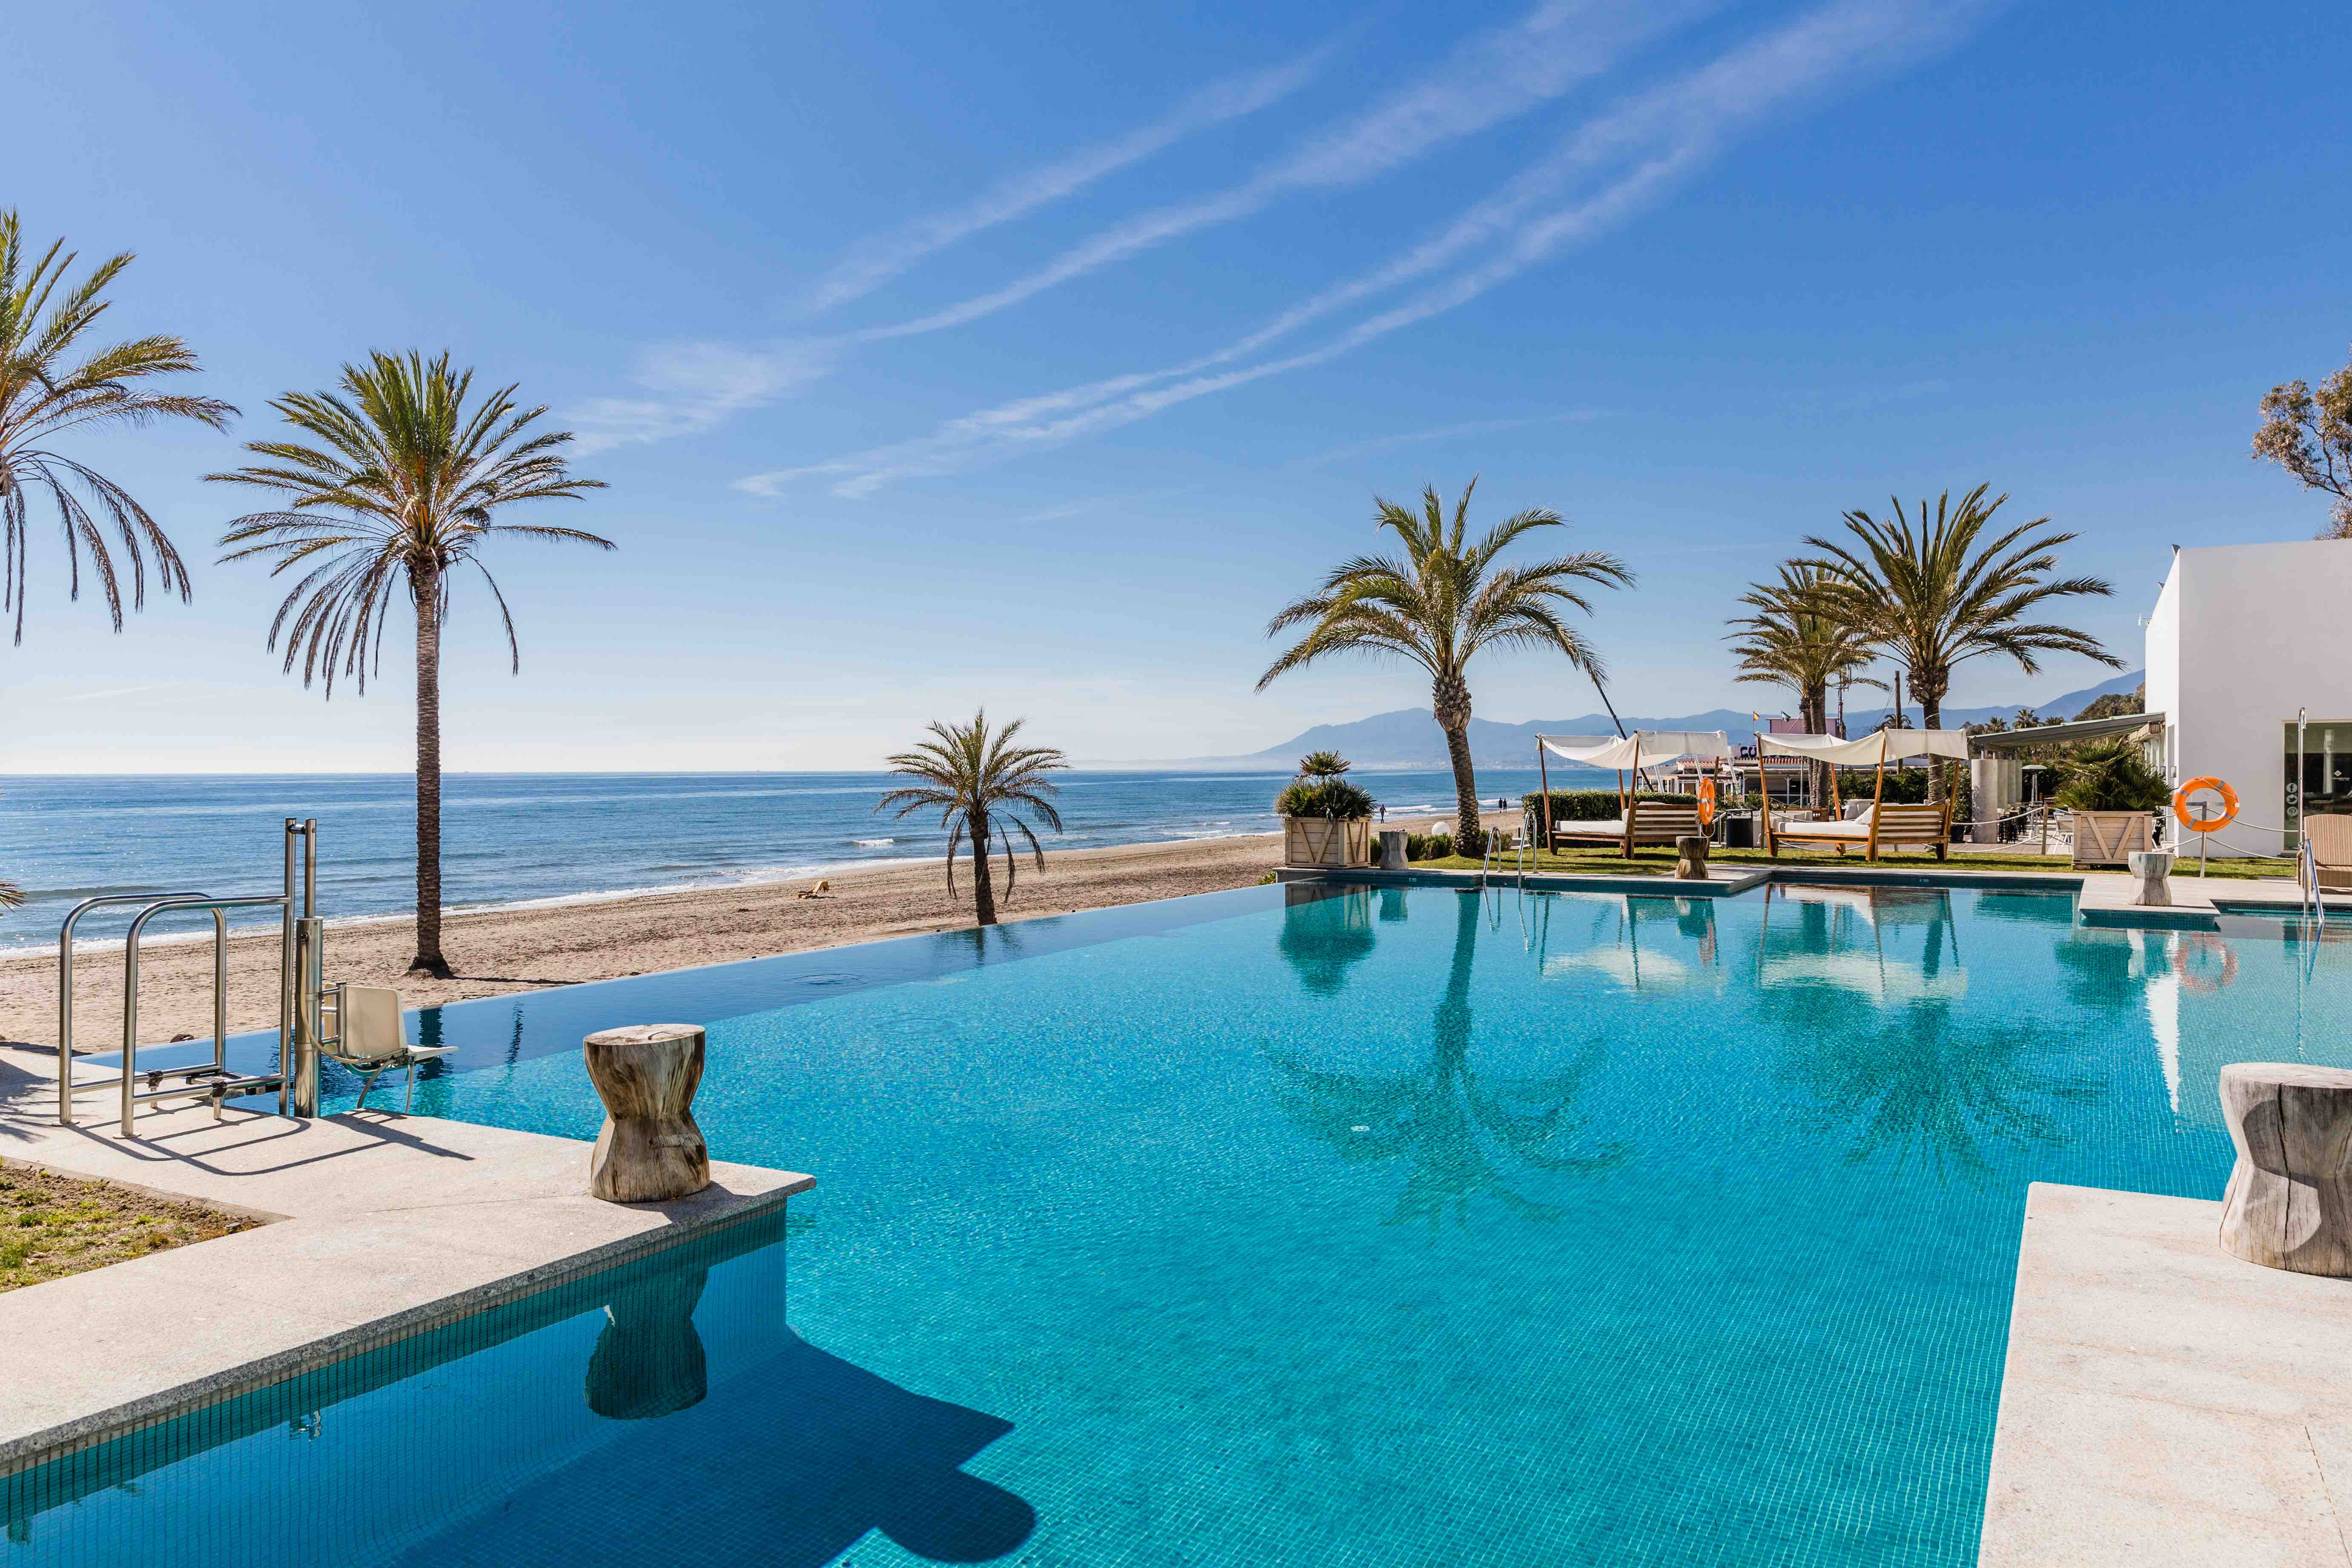 Beach Club Estrella del Mar - Marbella